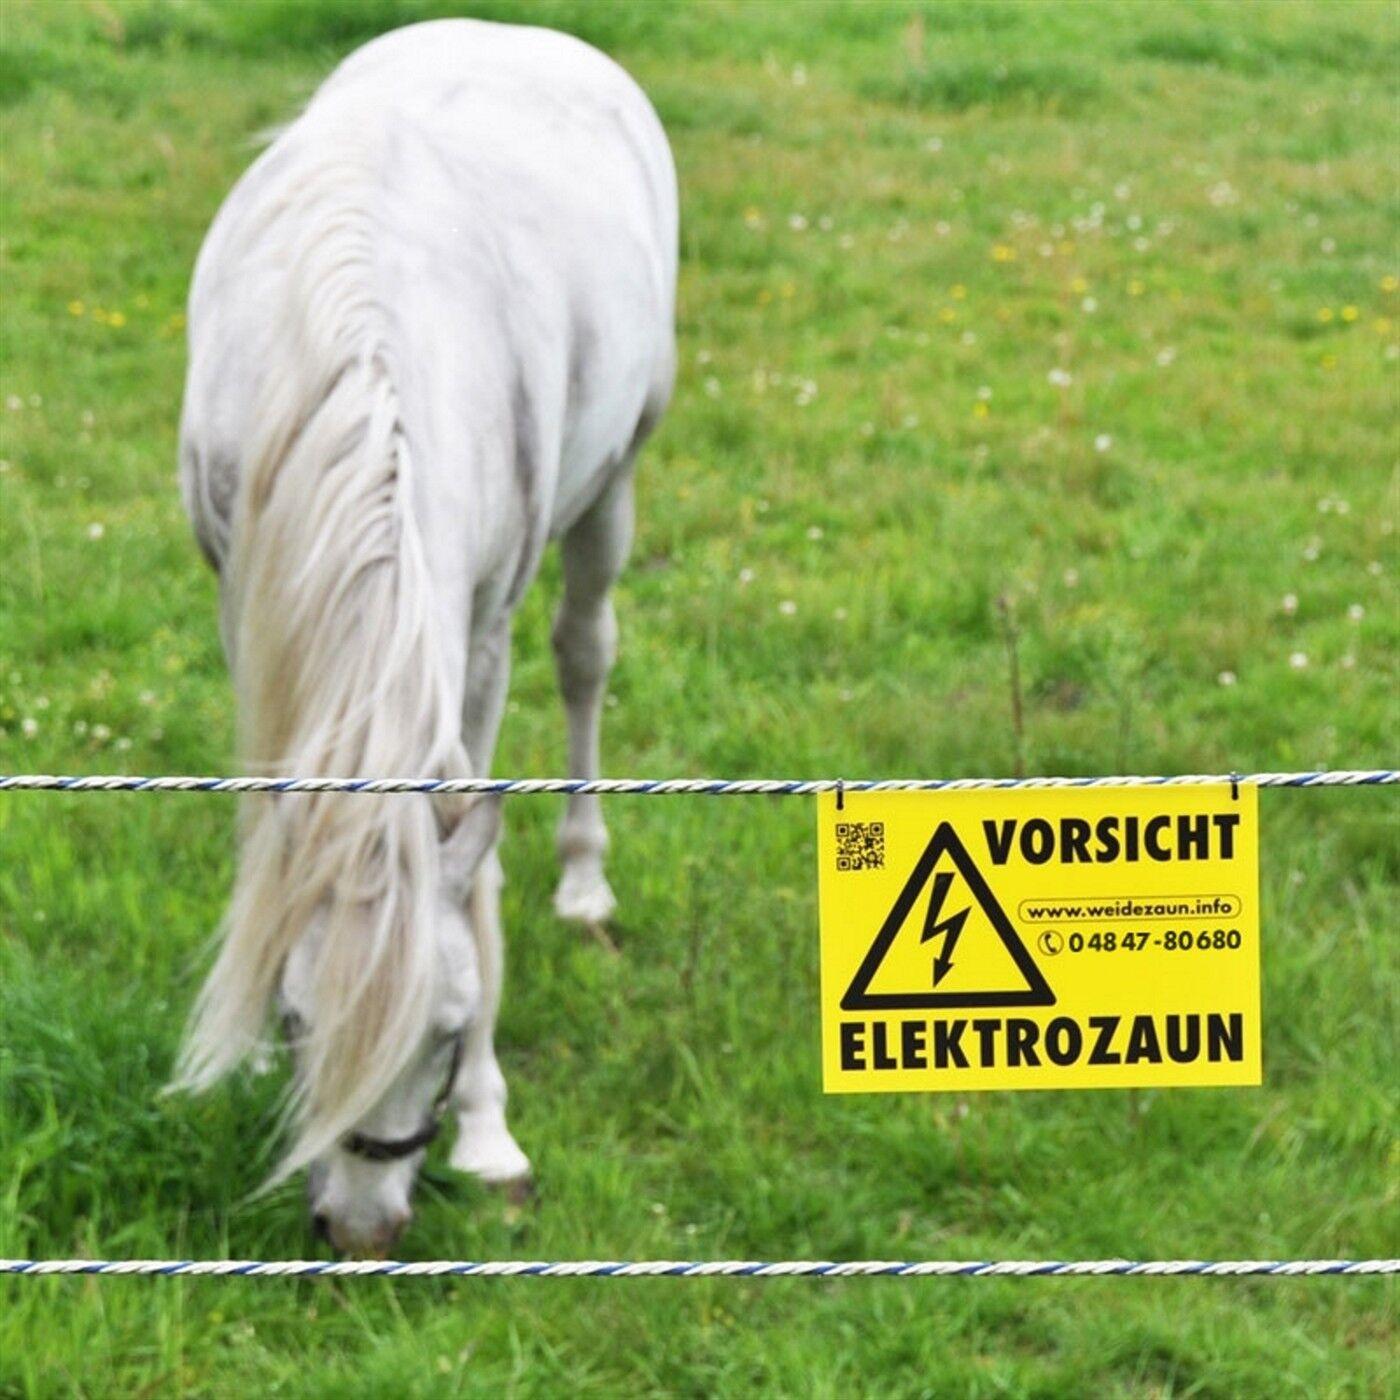 1600m 20mm 20mm 20mm Weidezaun Band Elektro Zaun Pferde Pony Schaf Rinder Ziegen Hunde a47a9b